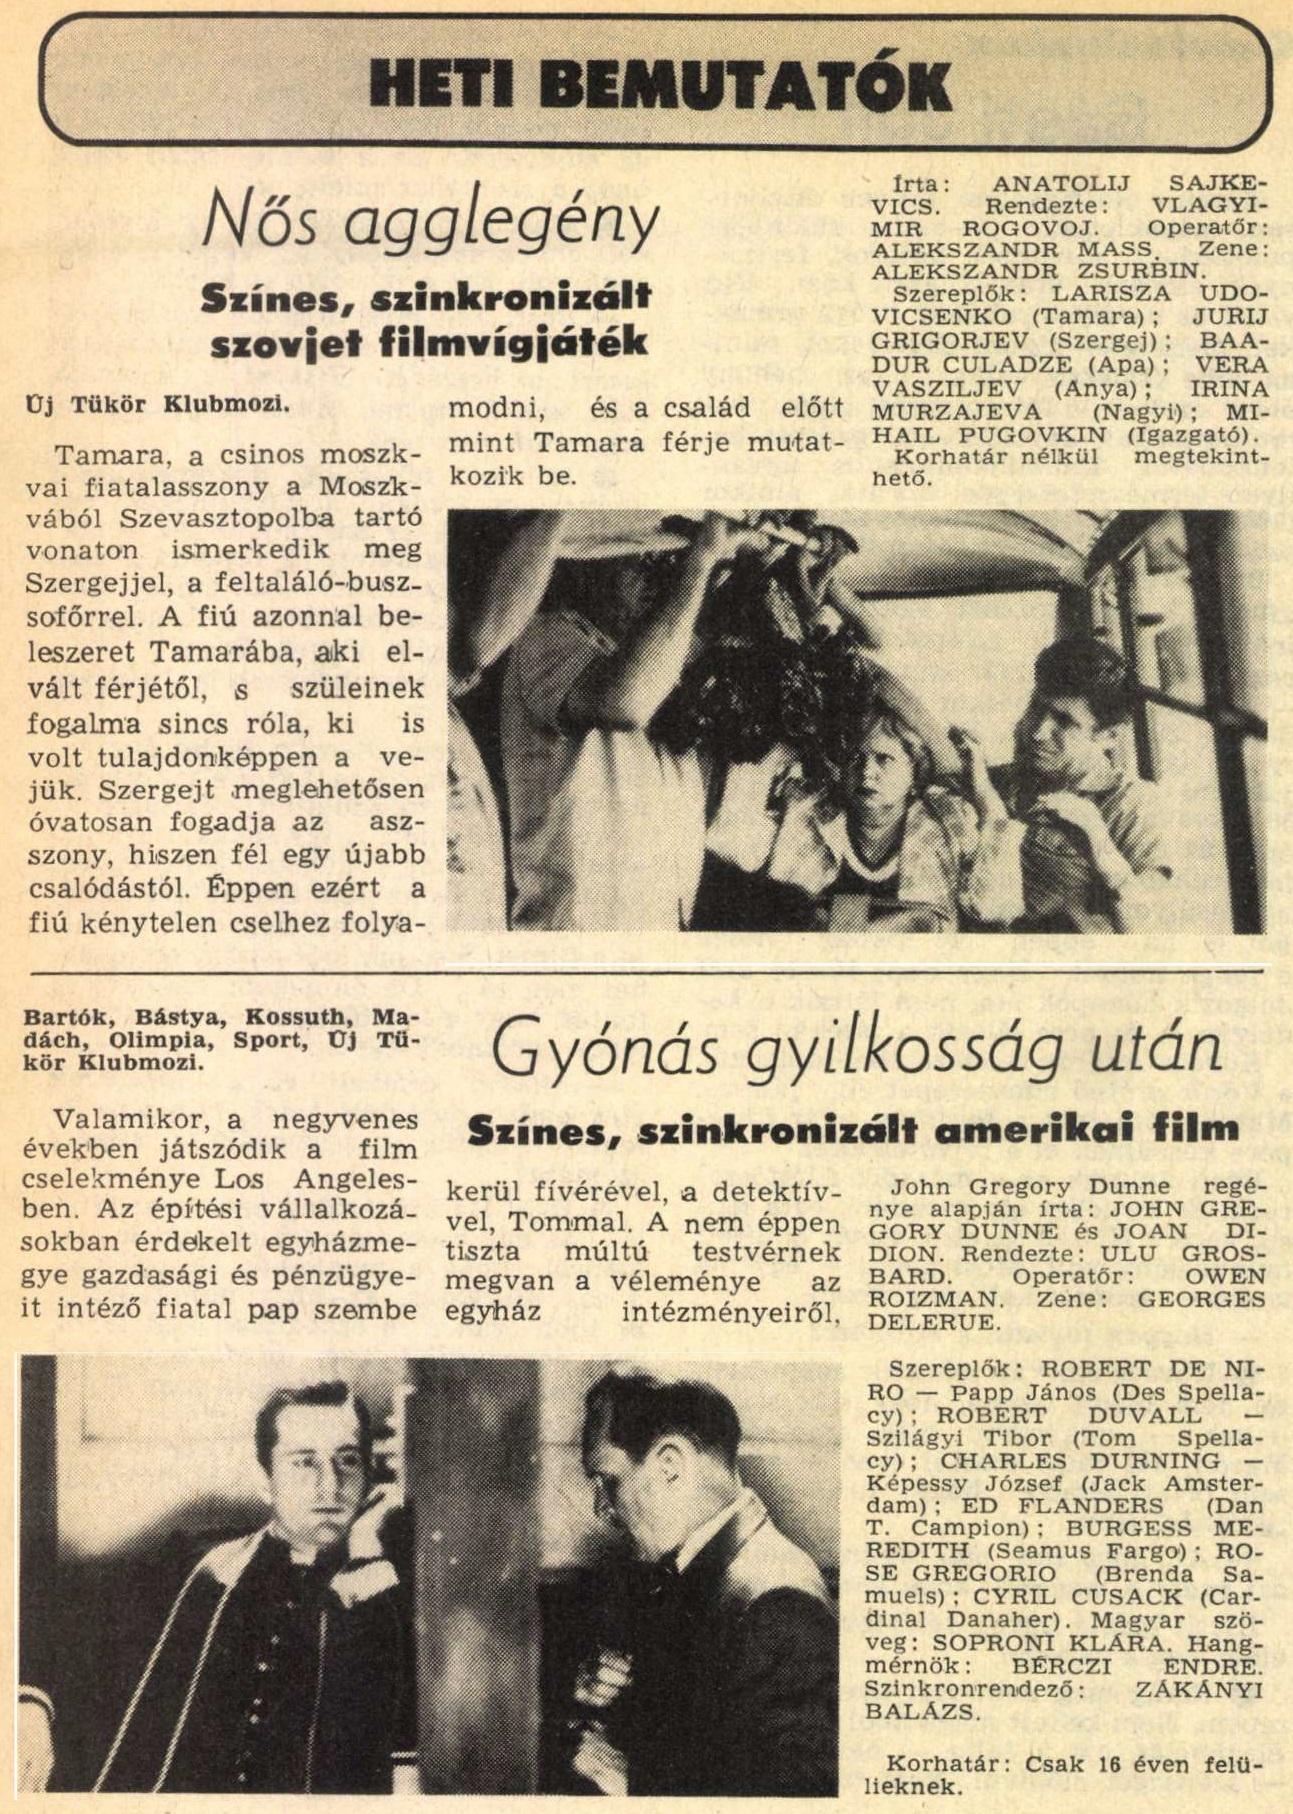 idokapszula_nb_i_1983_84_magyarorszag_spanyolorszag_mozi.jpg